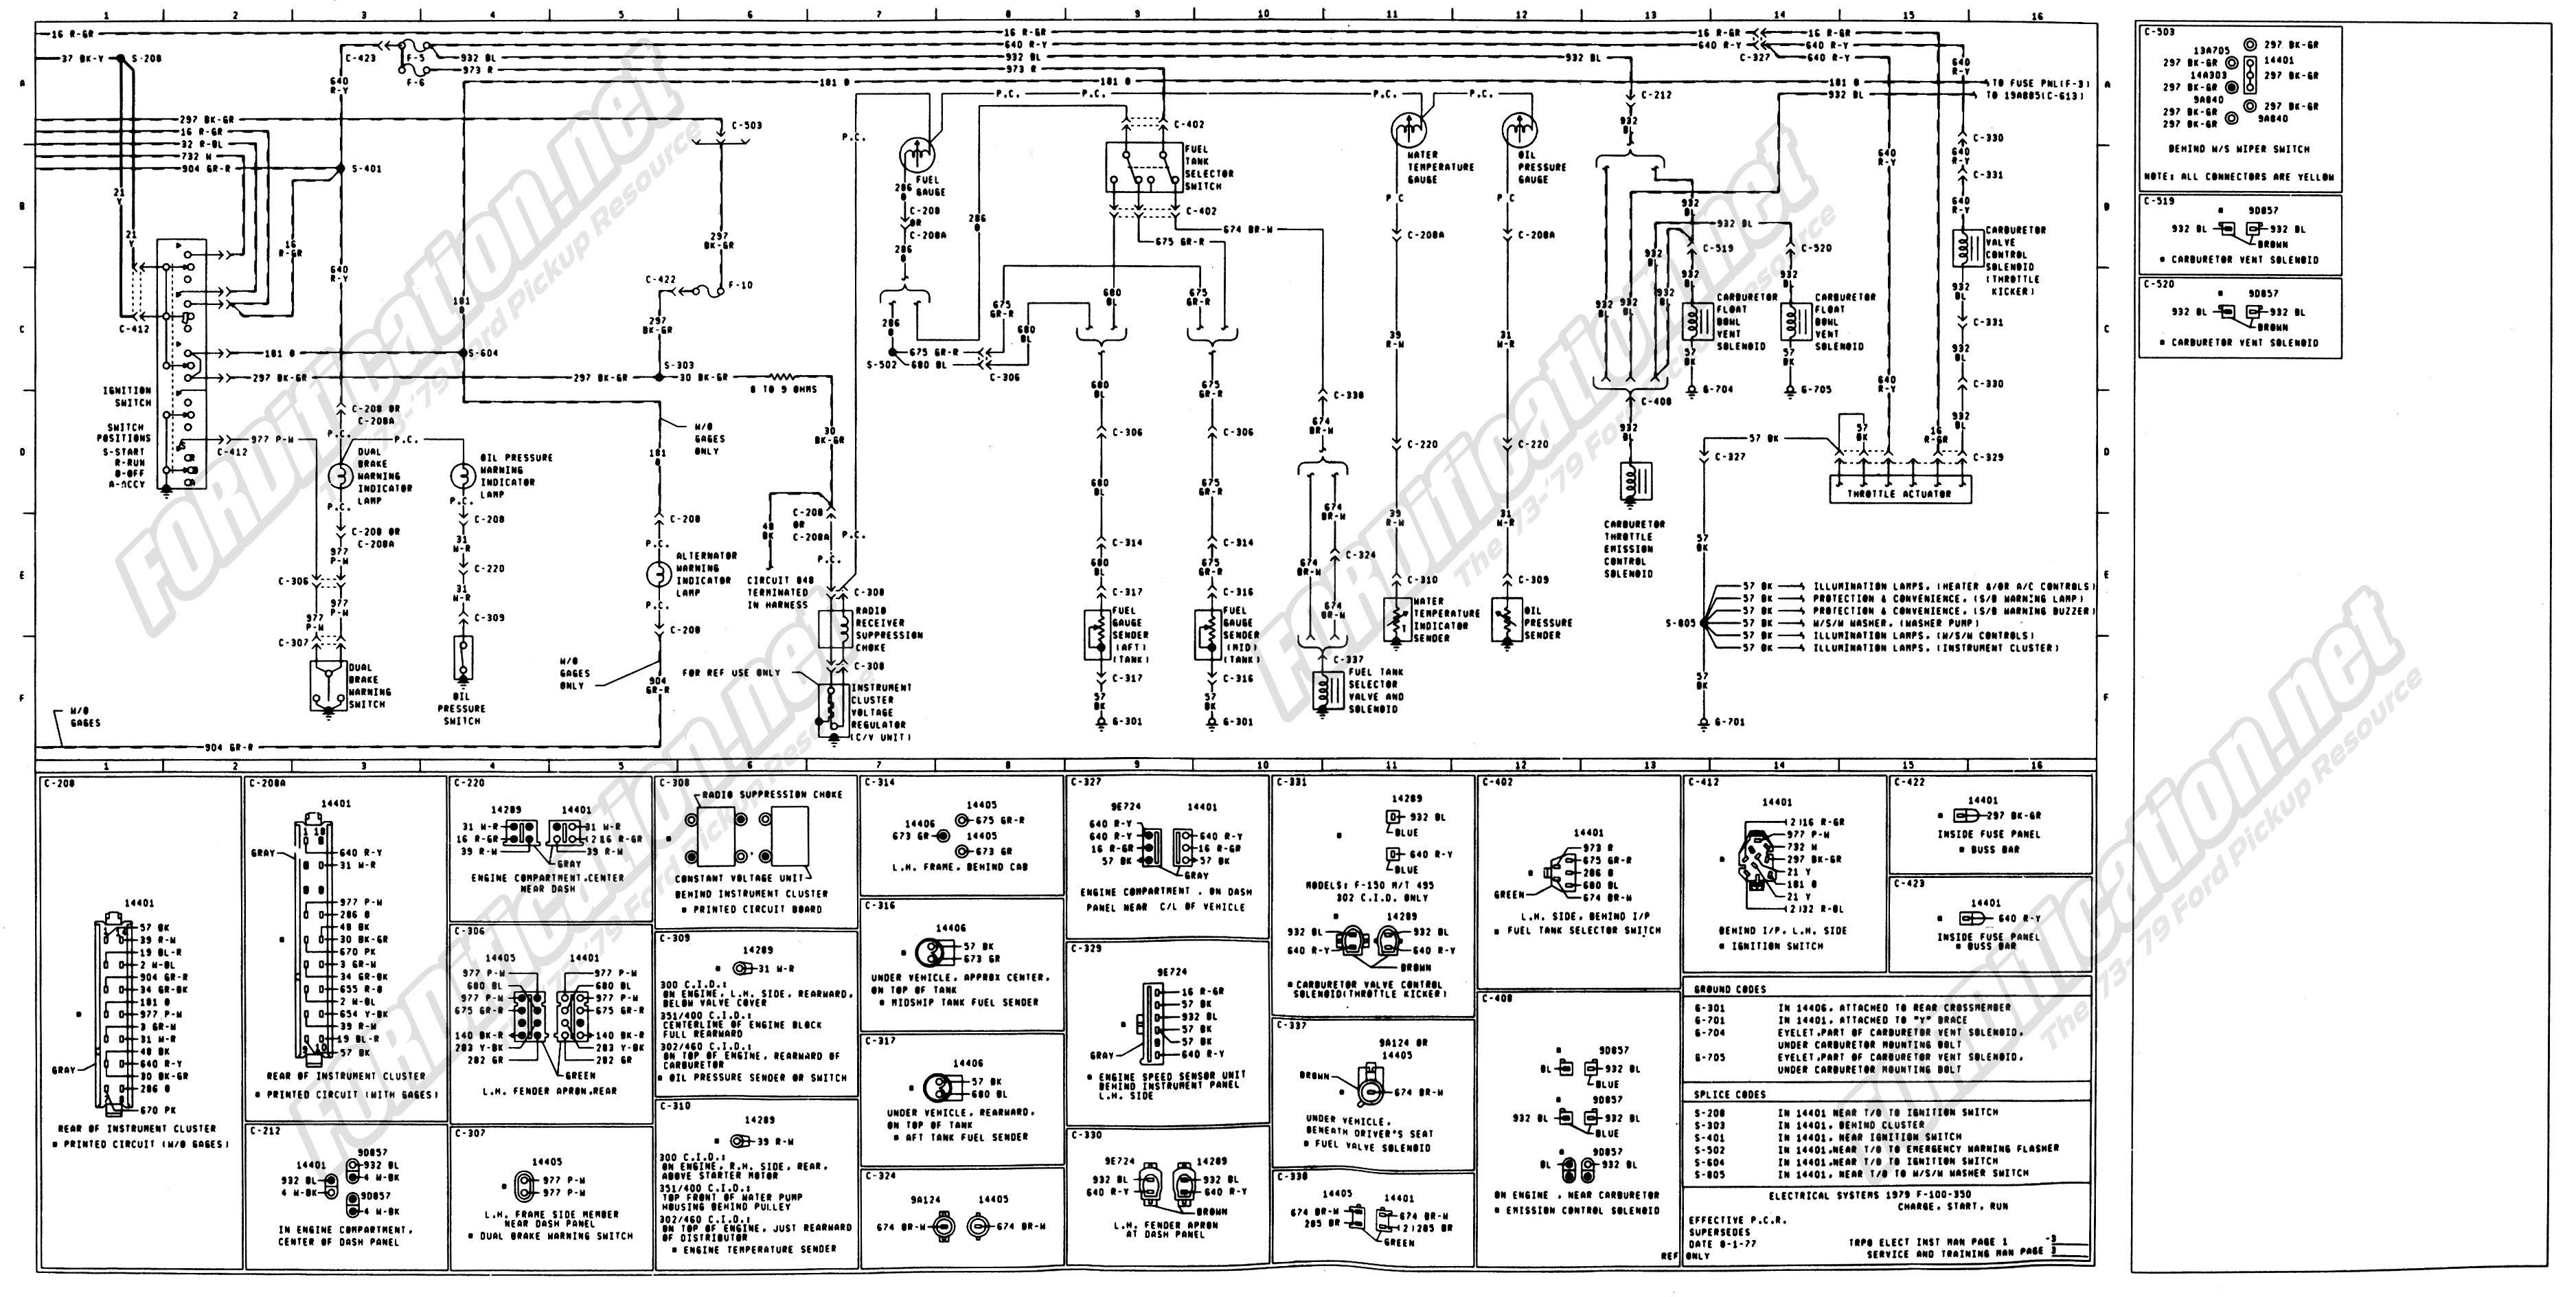 1975 Ford F 250 390 Wiring Diagram Wiring Diagram System Write Norm Write Norm Ediliadesign It